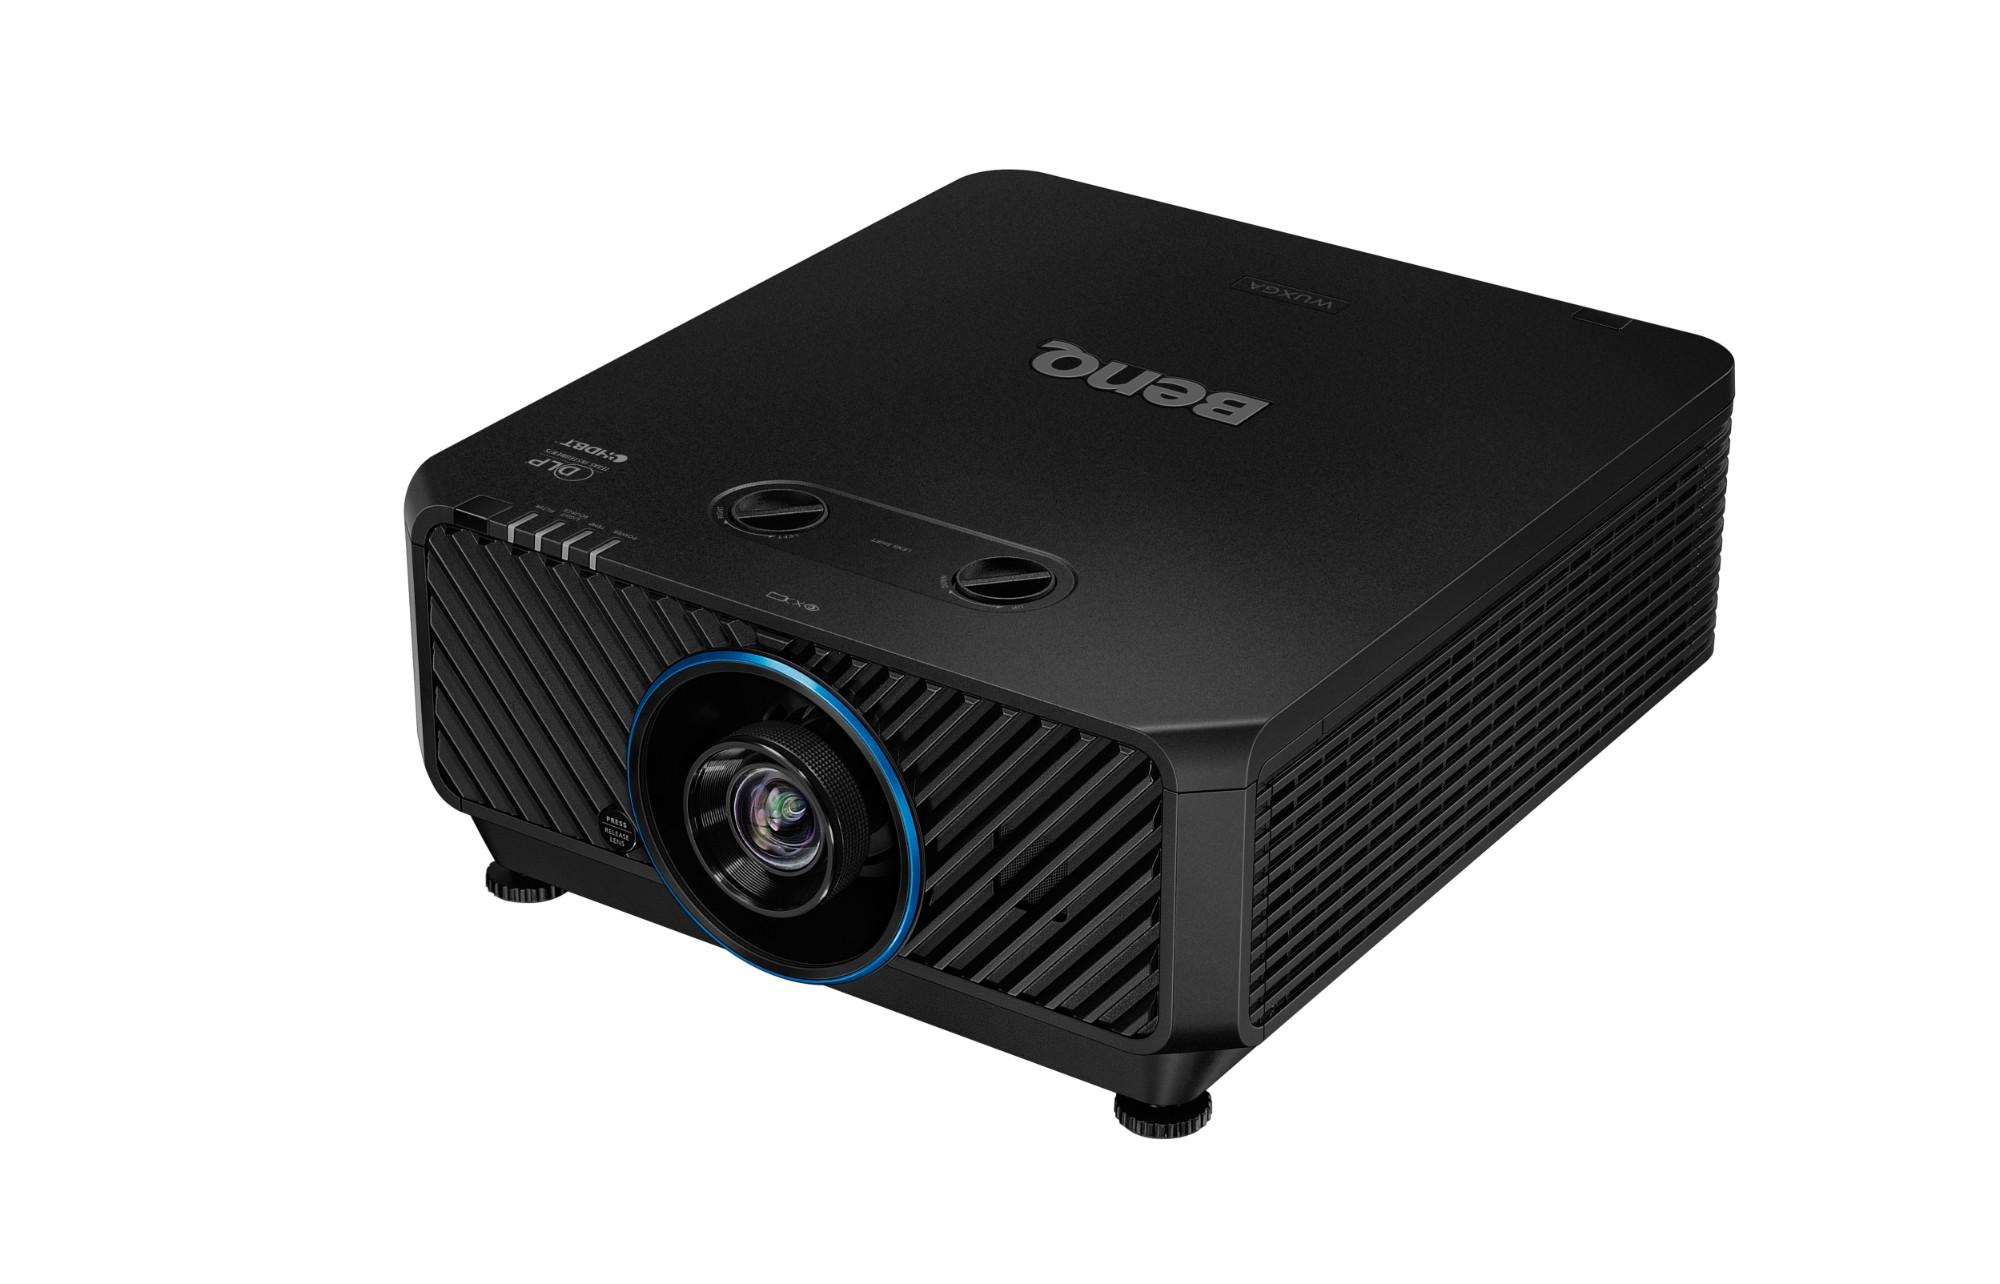 Benq LU9235 6000ANSI lumens DLP WUXGA (1920x1200) Black data projector